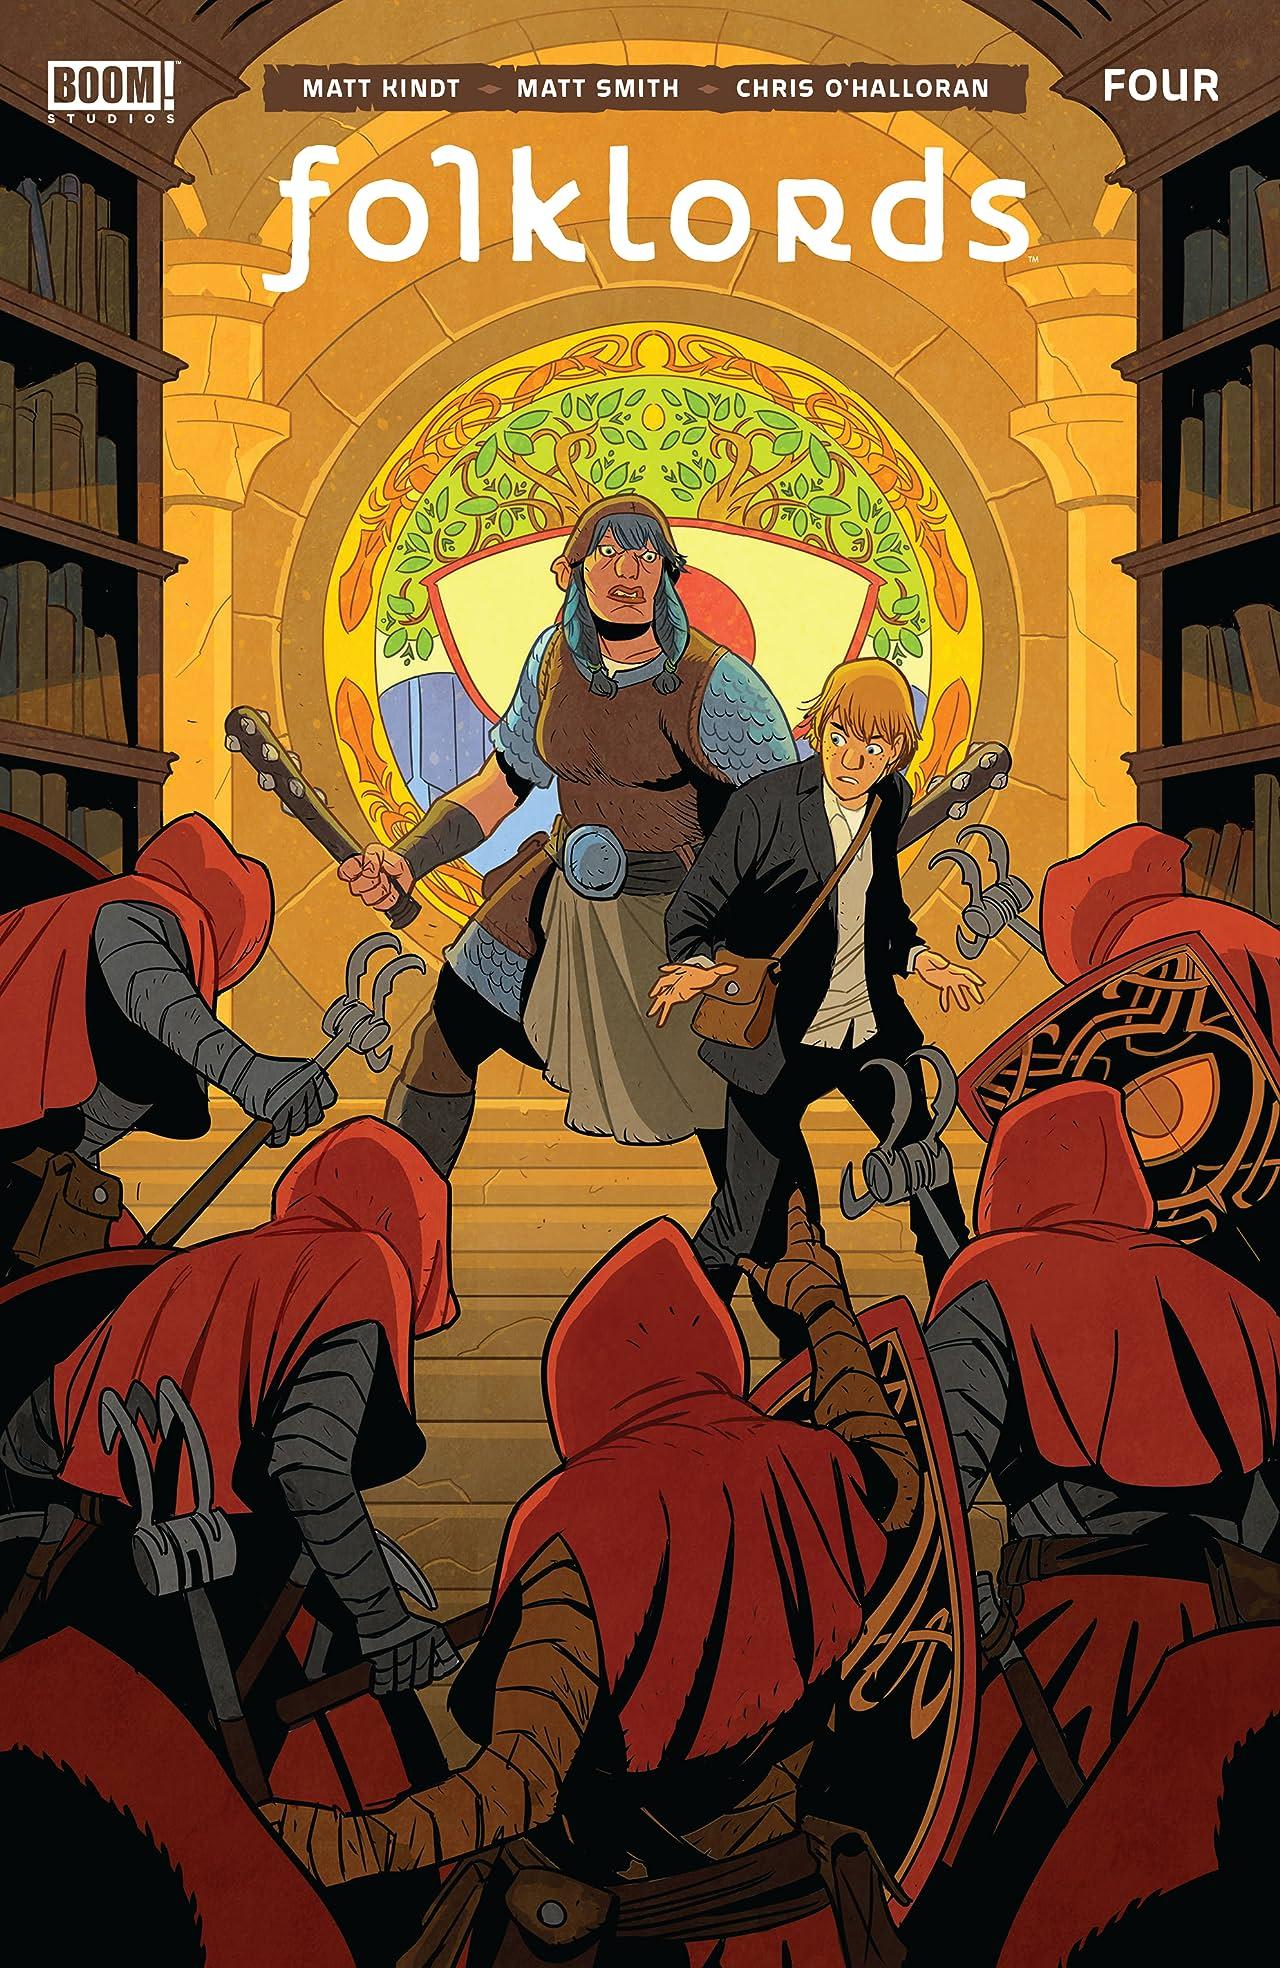 Folklords #4